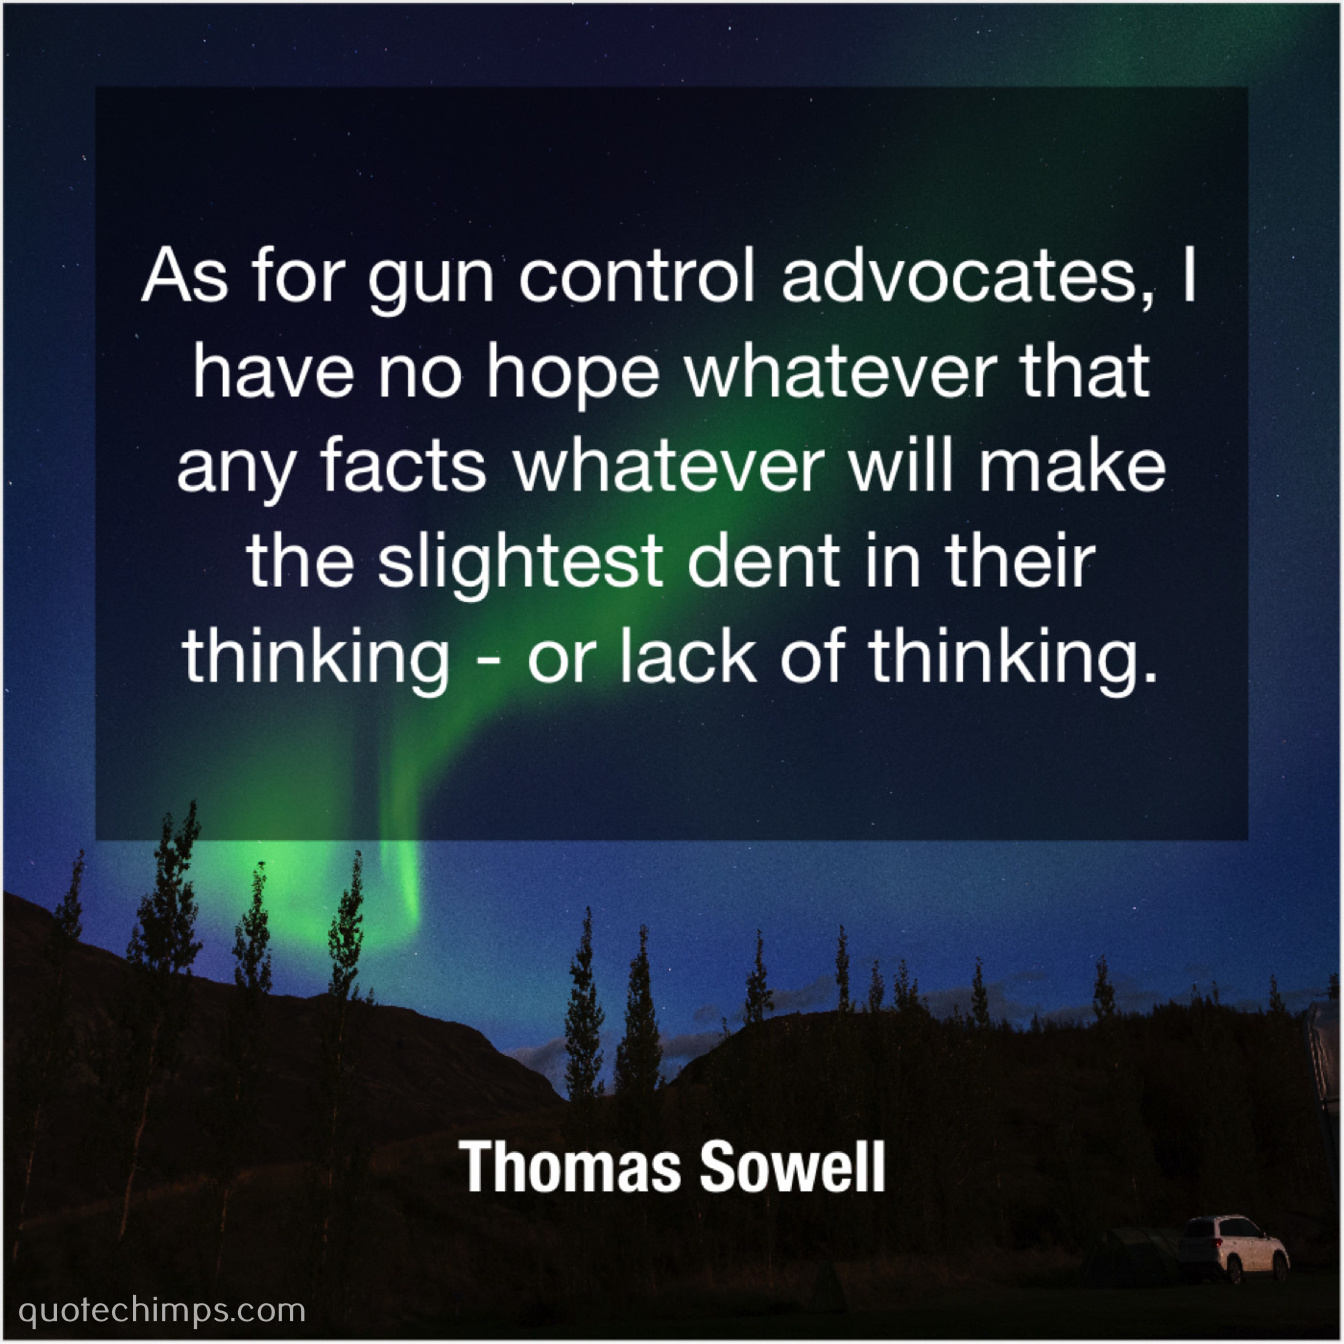 Thomas Sowell – As for gun control advocates… |